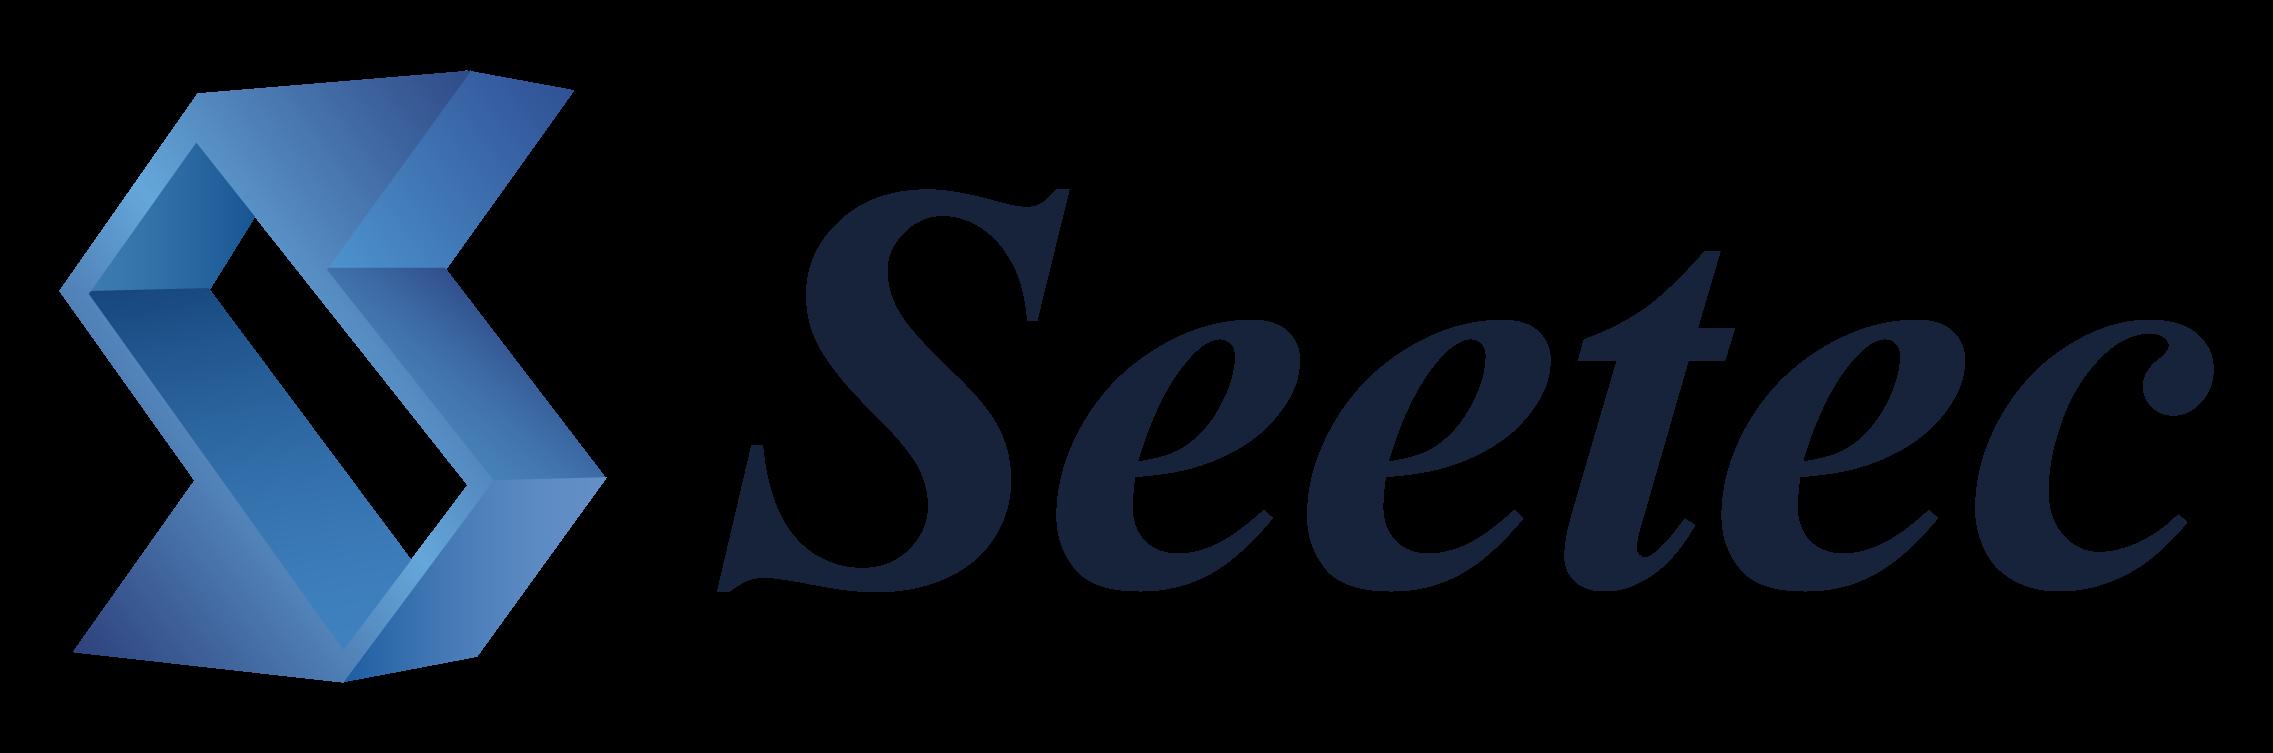 Seetec logo-01.png